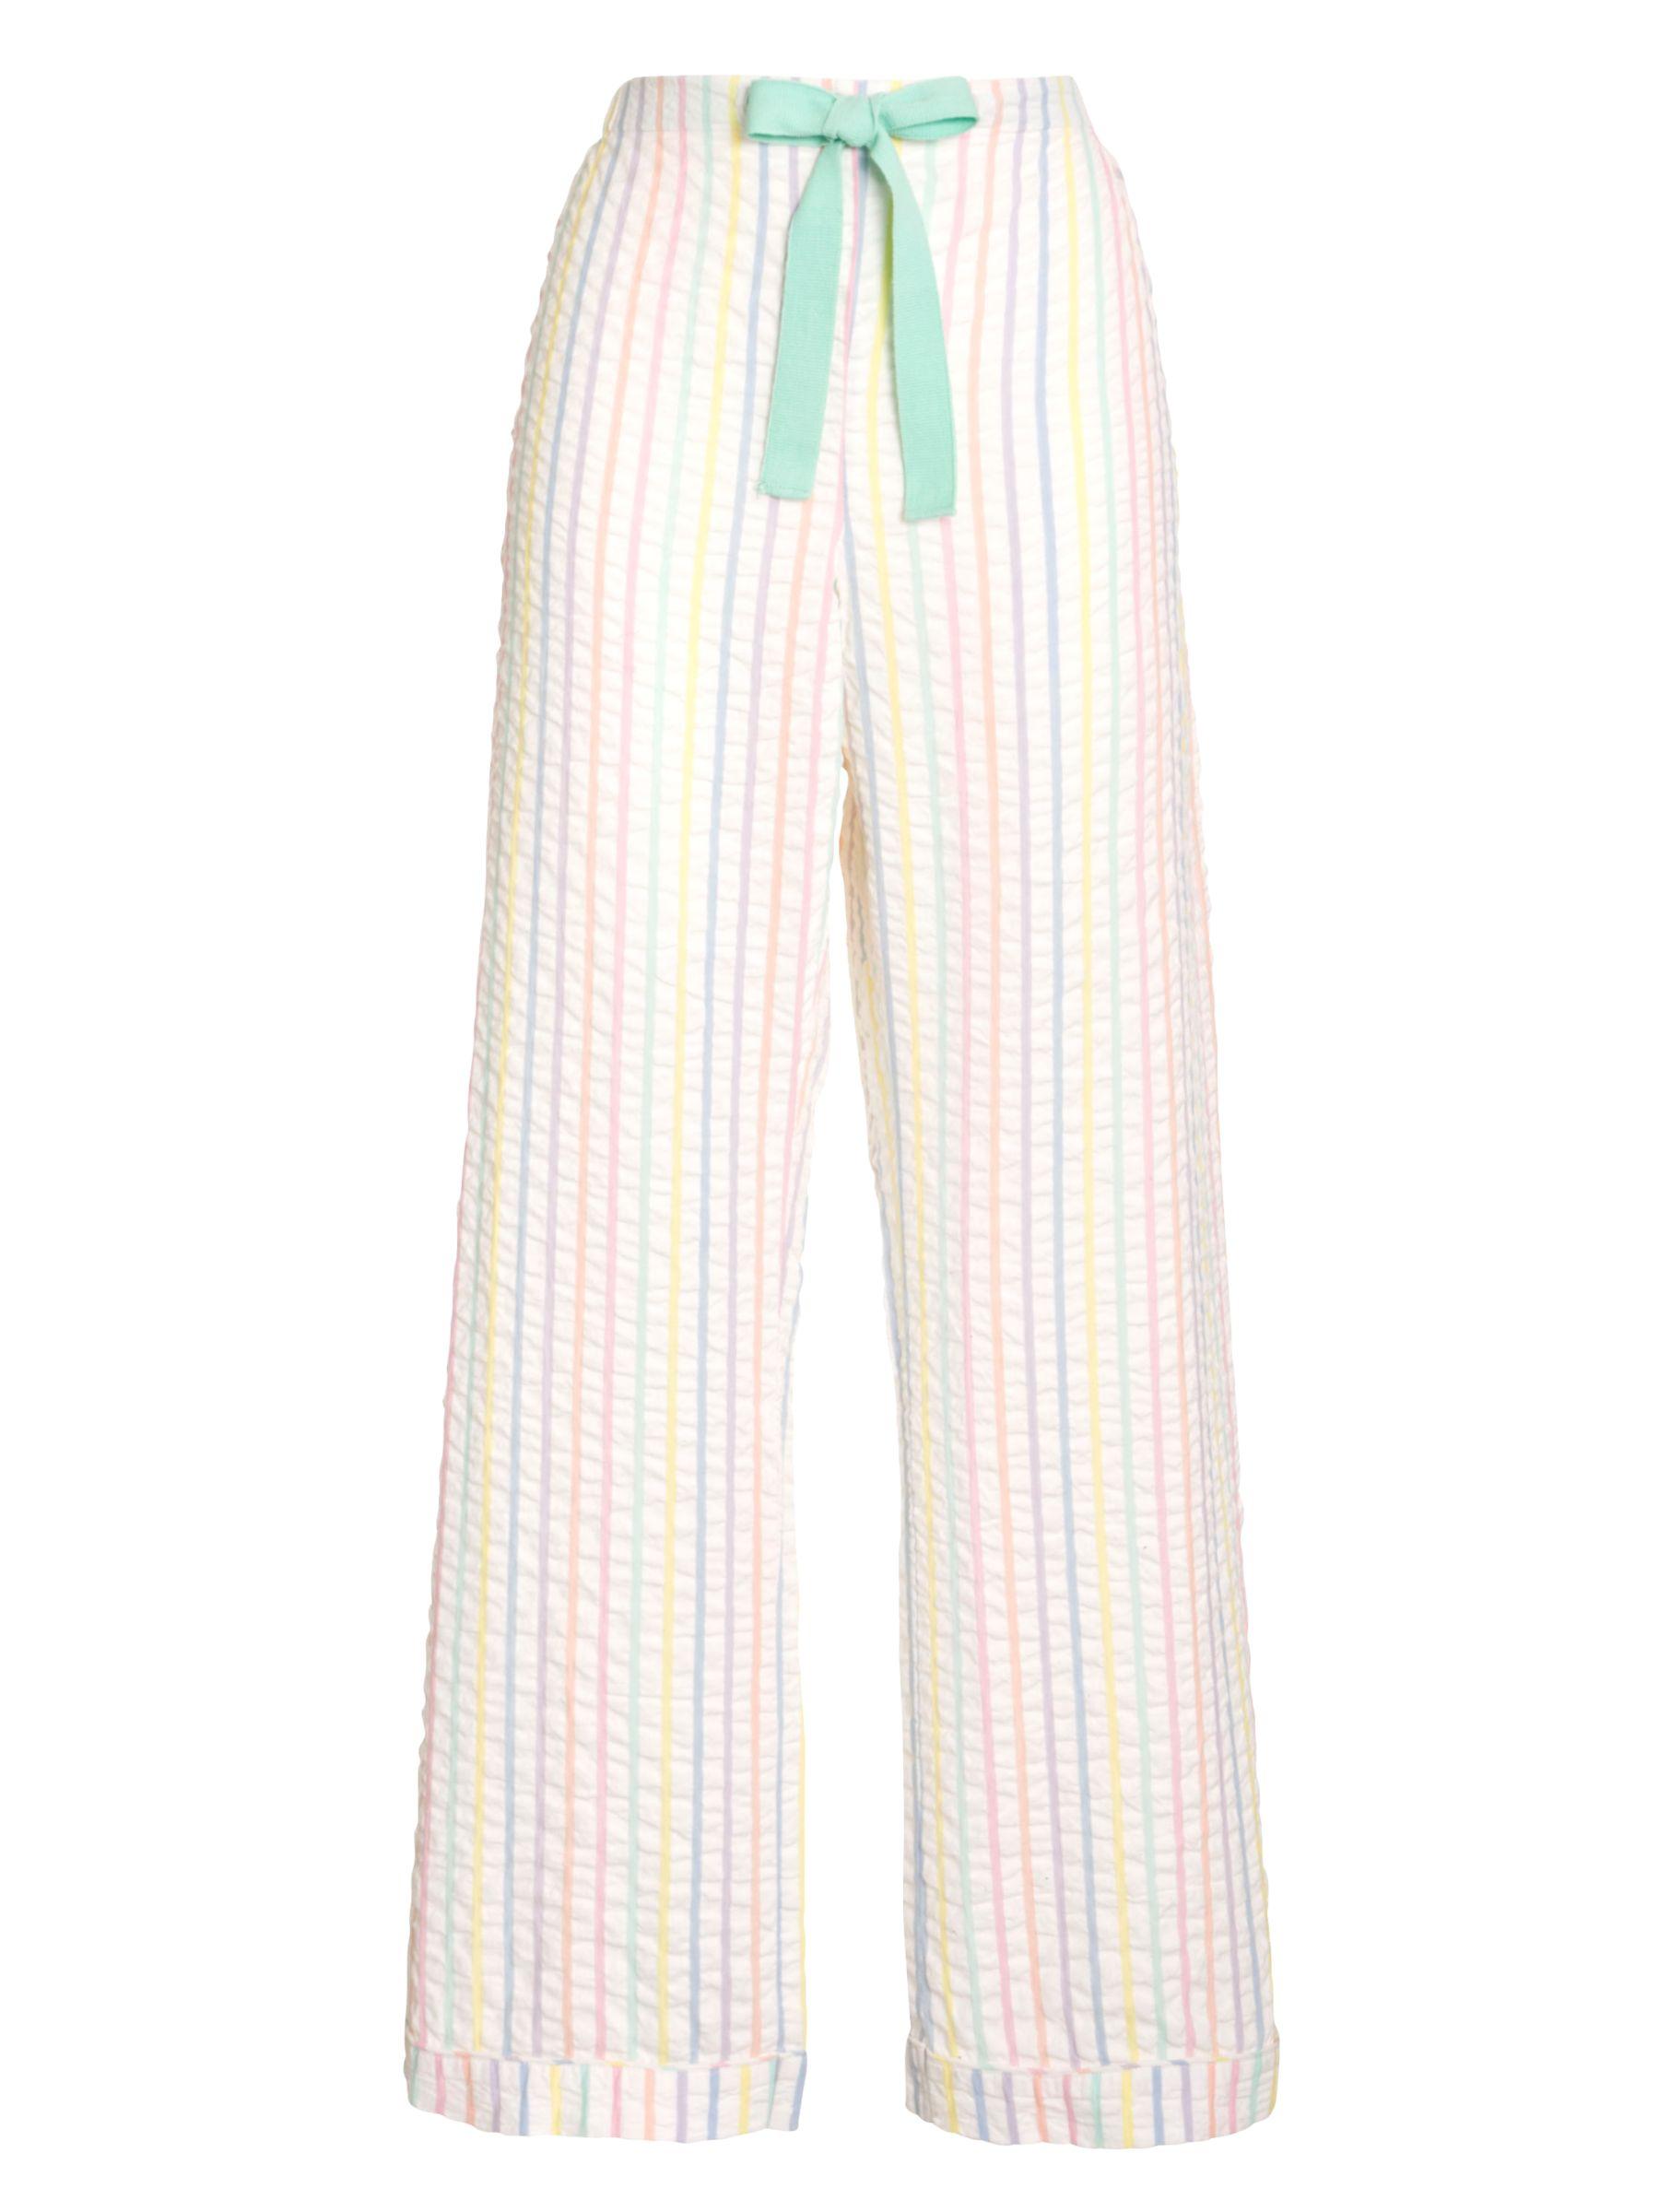 John Lewis Woven Stripe Pyjama Pants, Multi